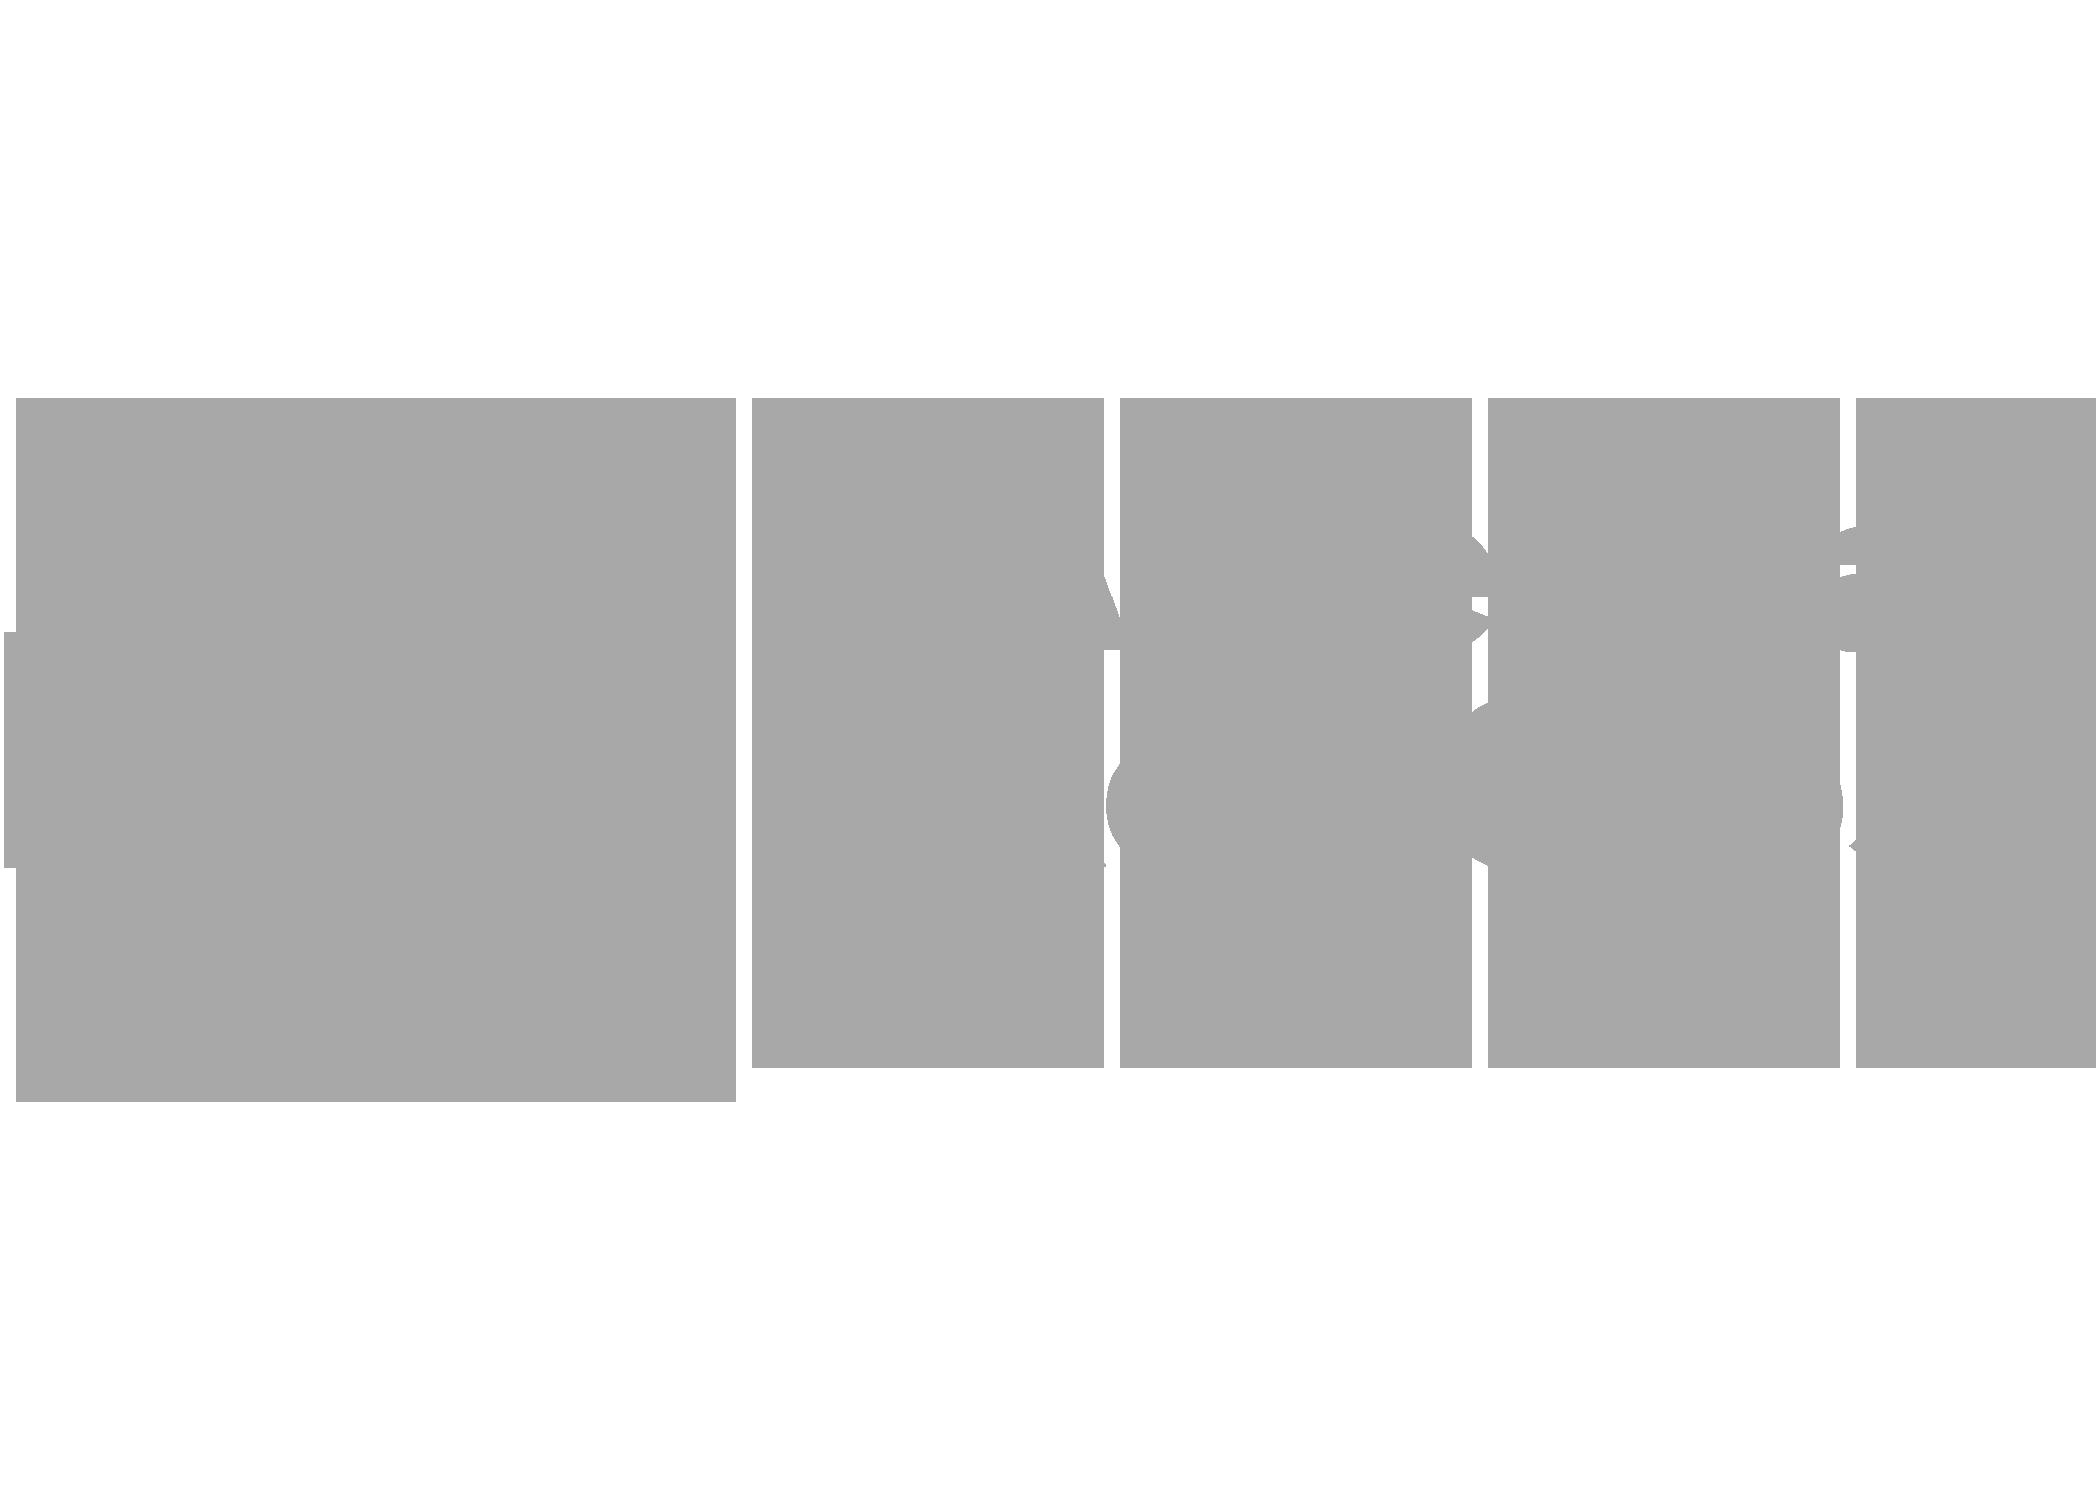 https://149346020.v2.pressablecdn.com/wp-content/uploads/2017/08/AmericanRedCross.png